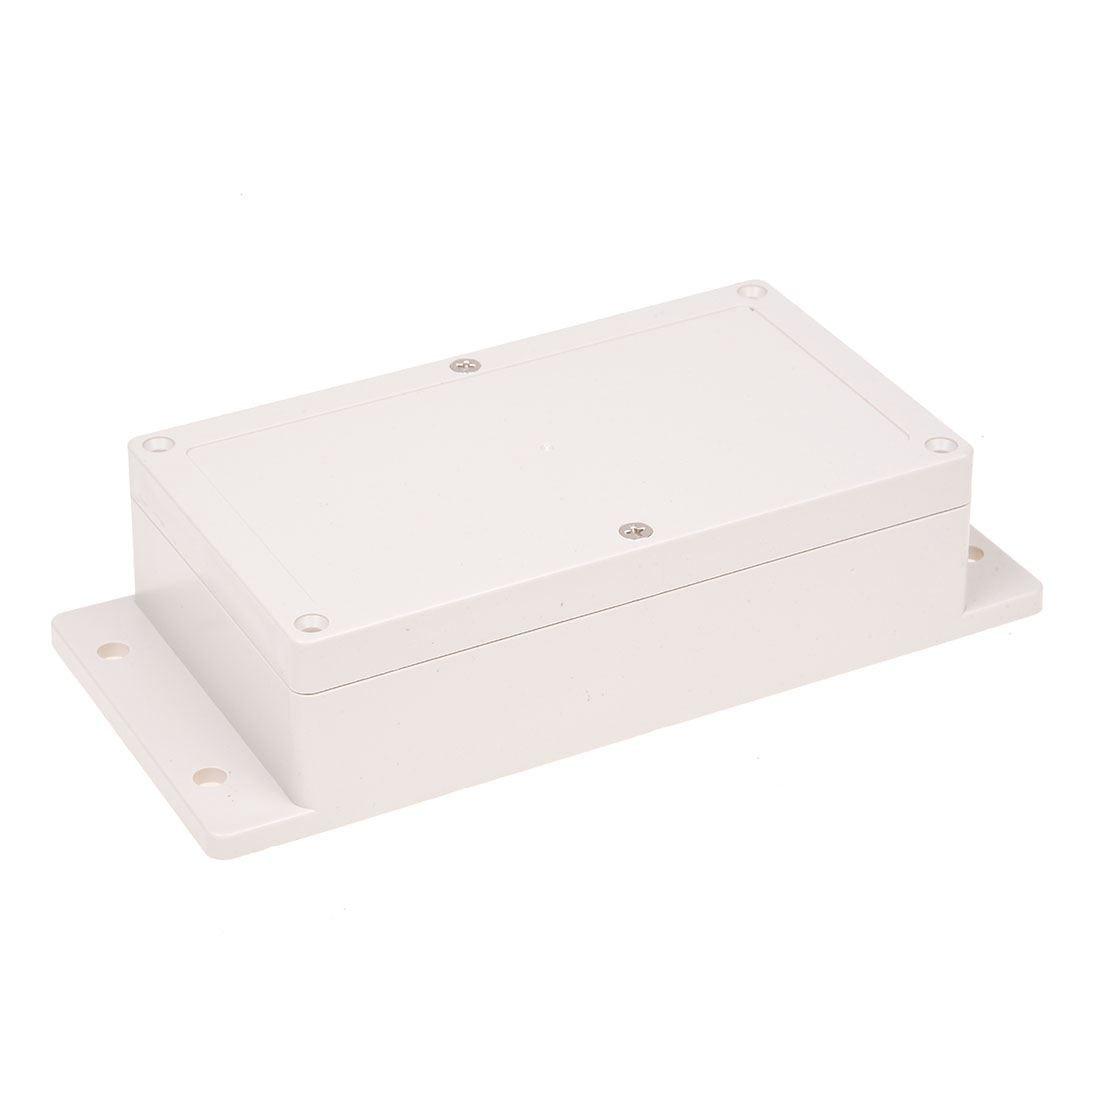 158mmx90mmx46mm Waterproof Plastic Enclosure Case Power Junction Box